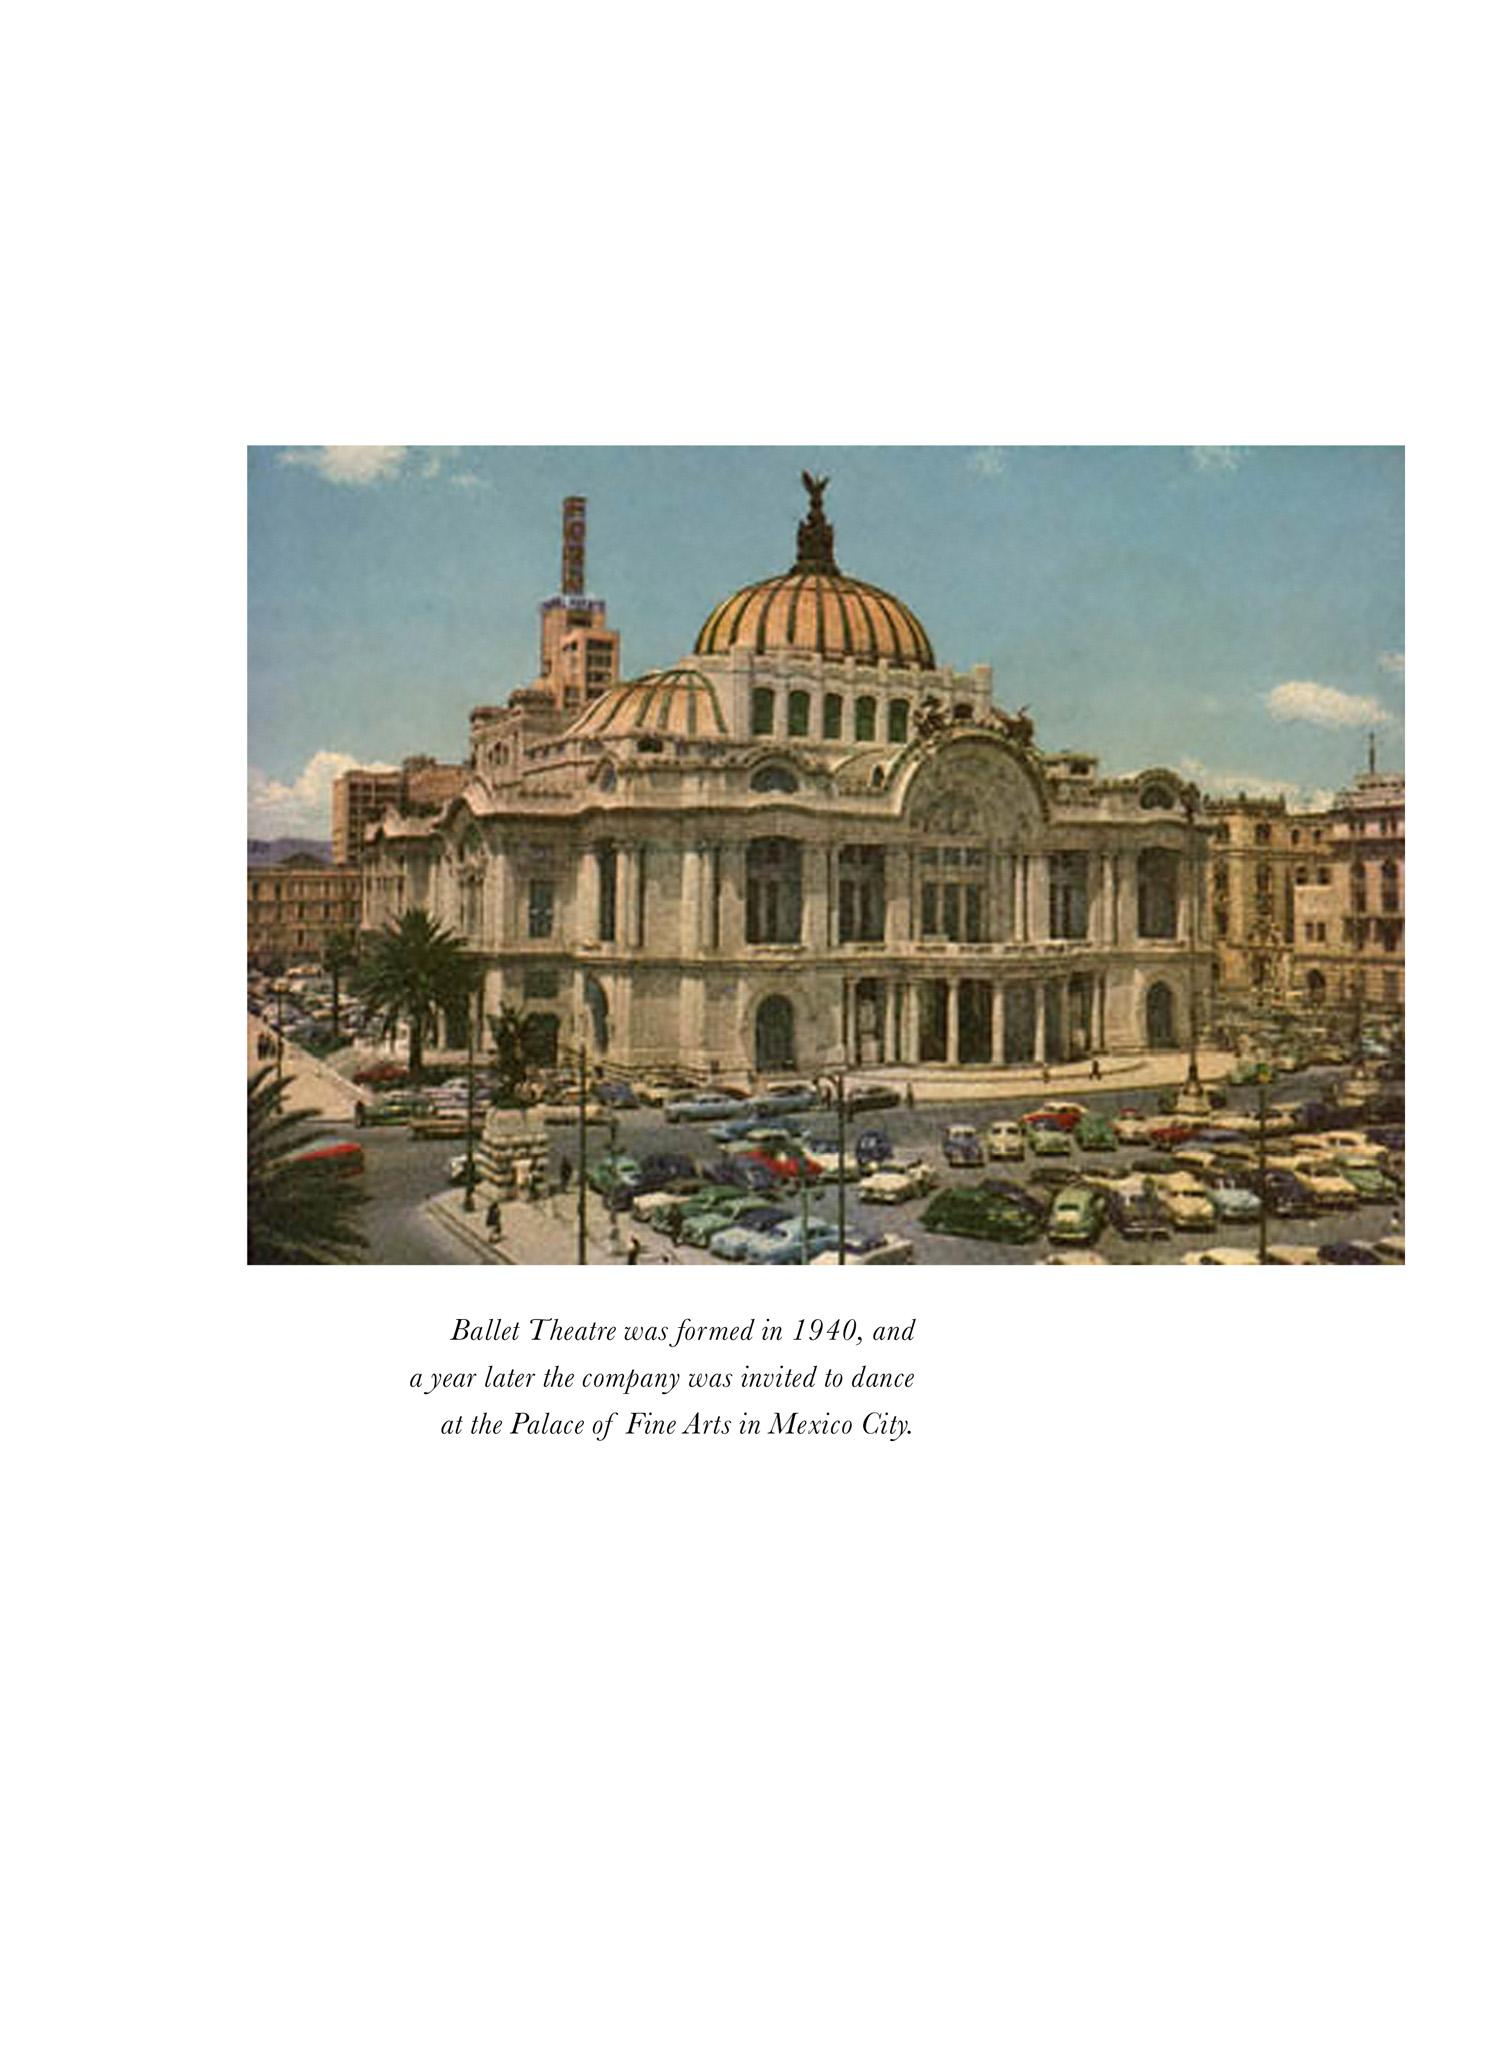 mexico book composite7.jpg